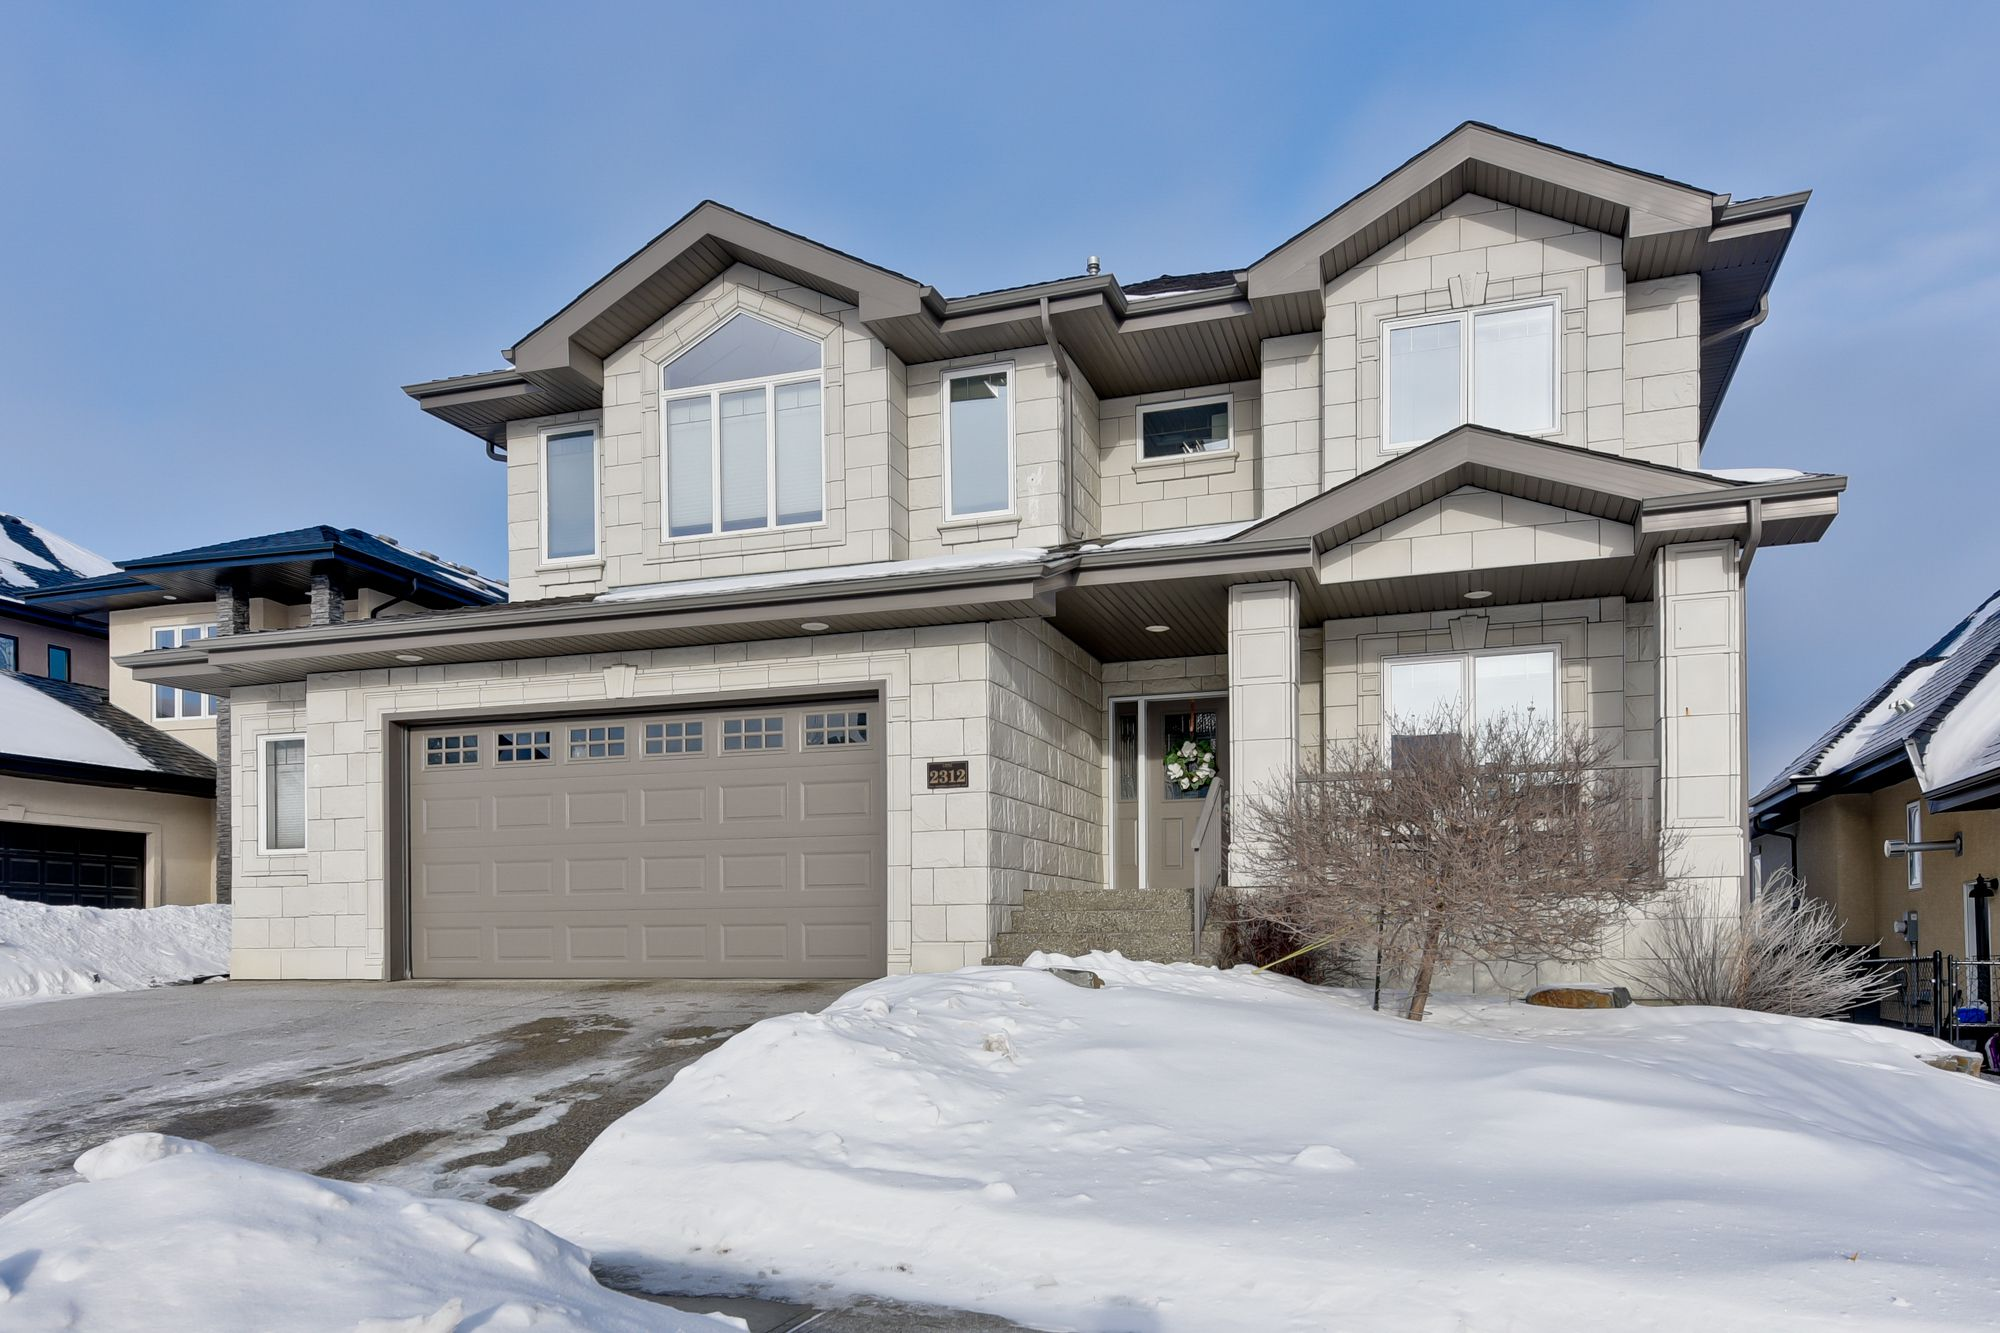 Main Photo: 2312 Martell Lane in Edmonton: House for sale